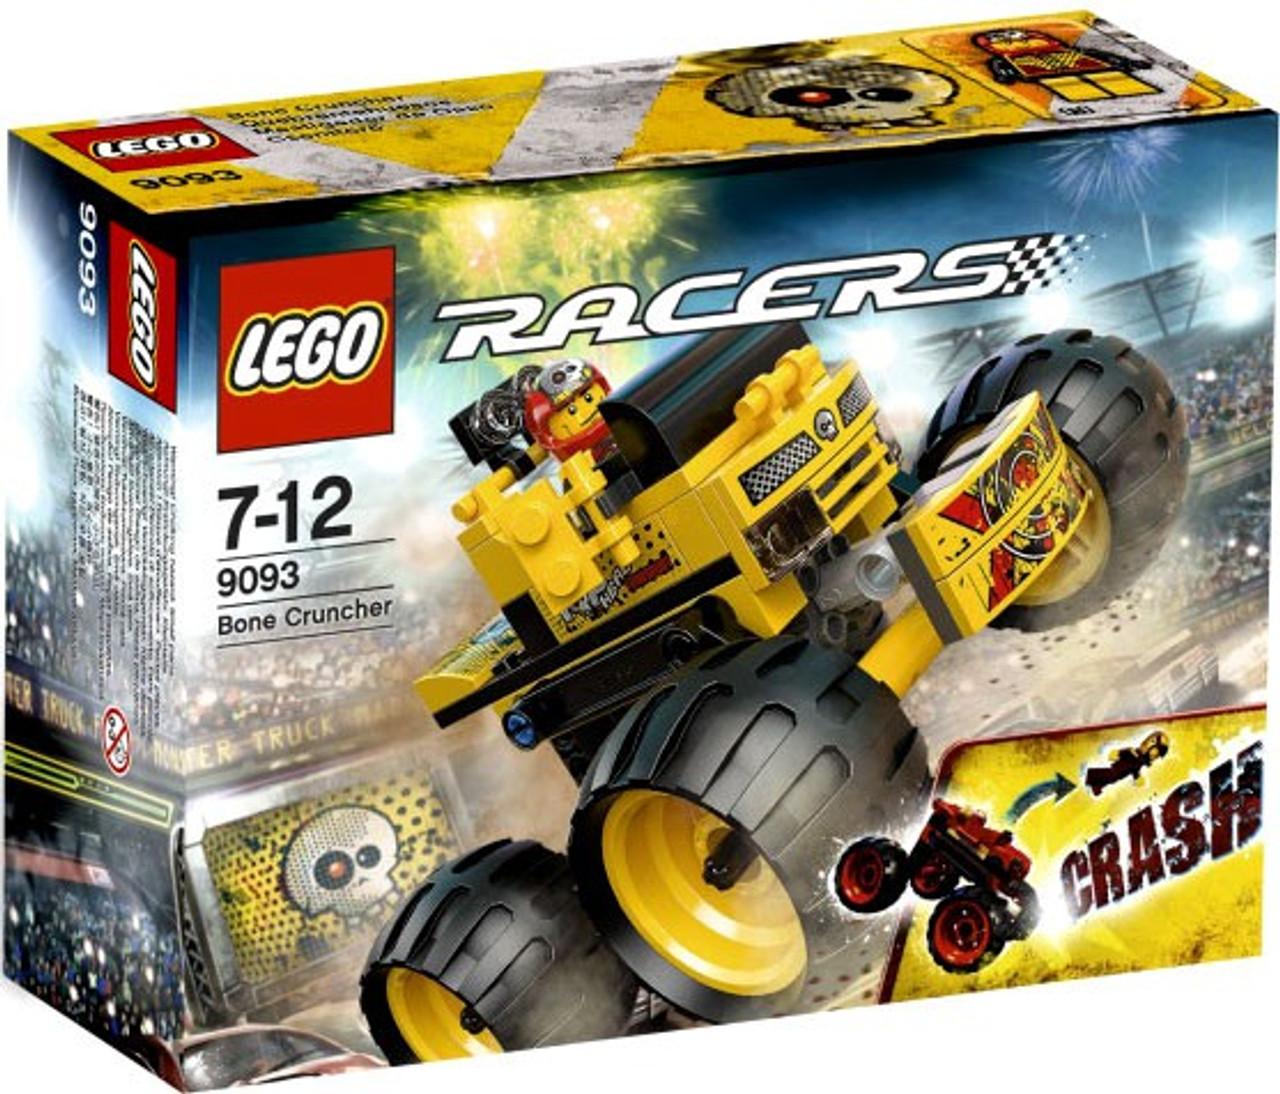 LEGO Racers Bone Cruncher Set #9093